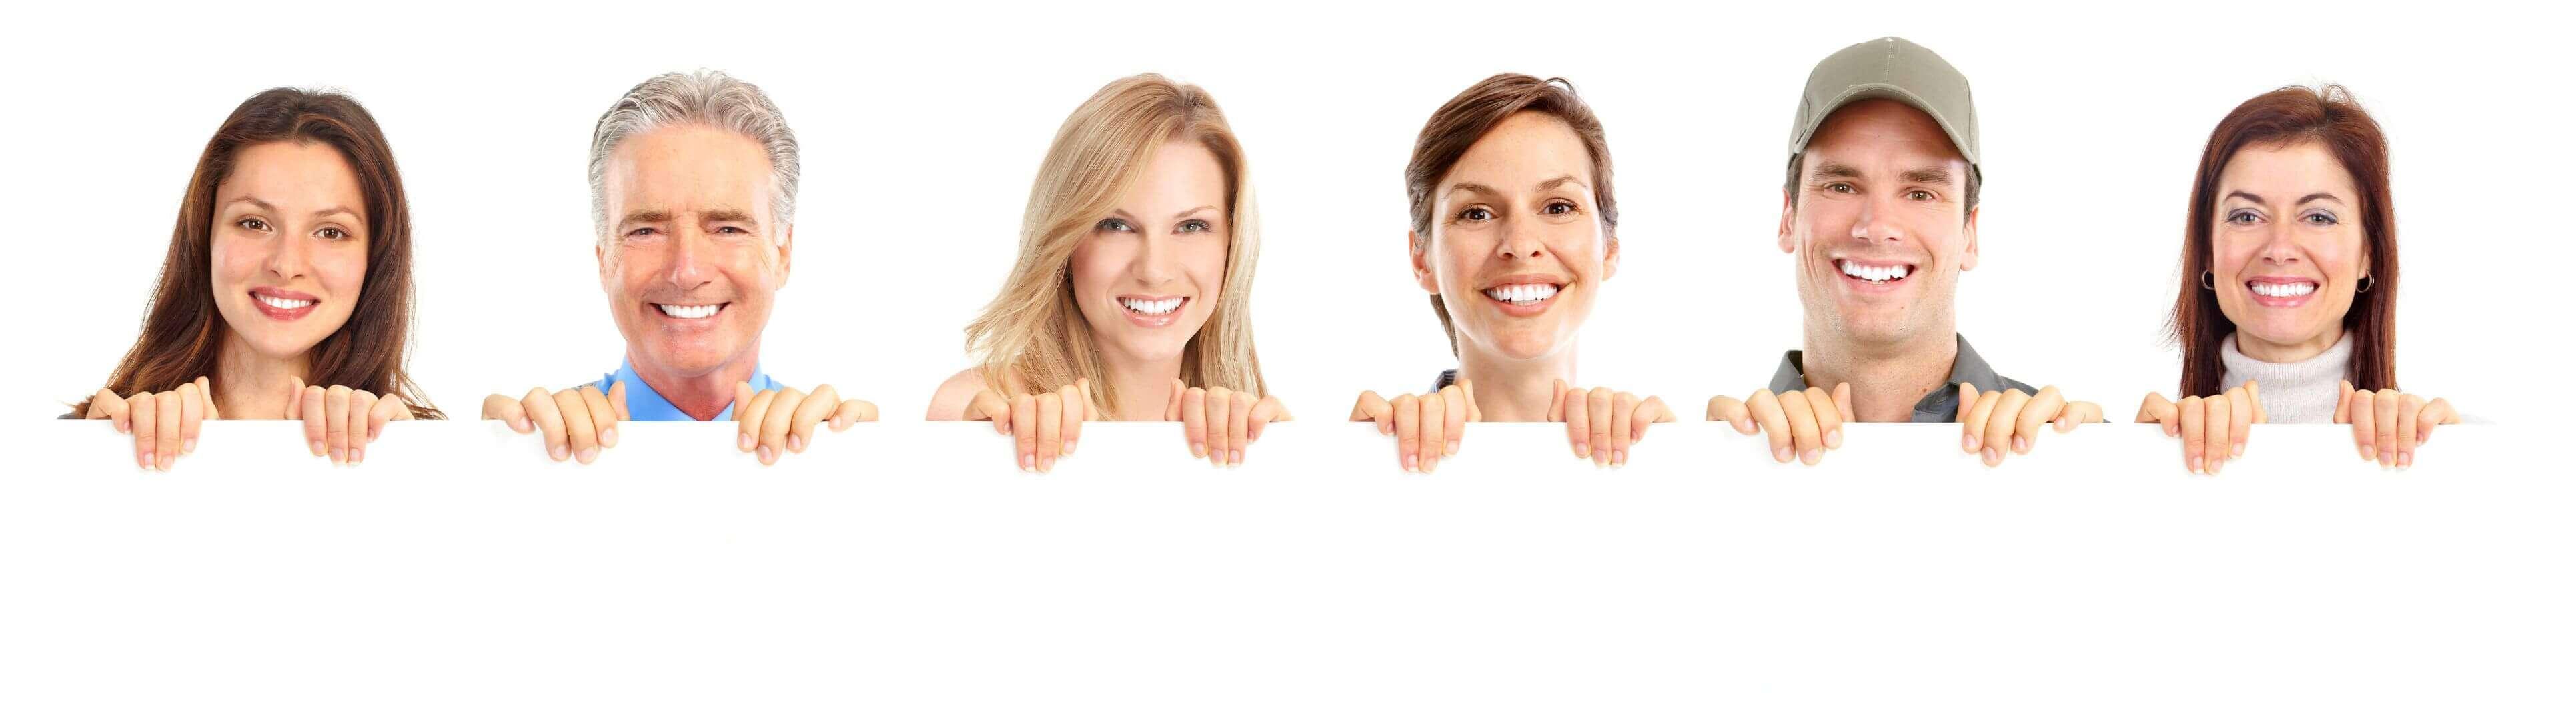 Dental Benefits - Use It or Loose It! - Dr. Alpa Dalal